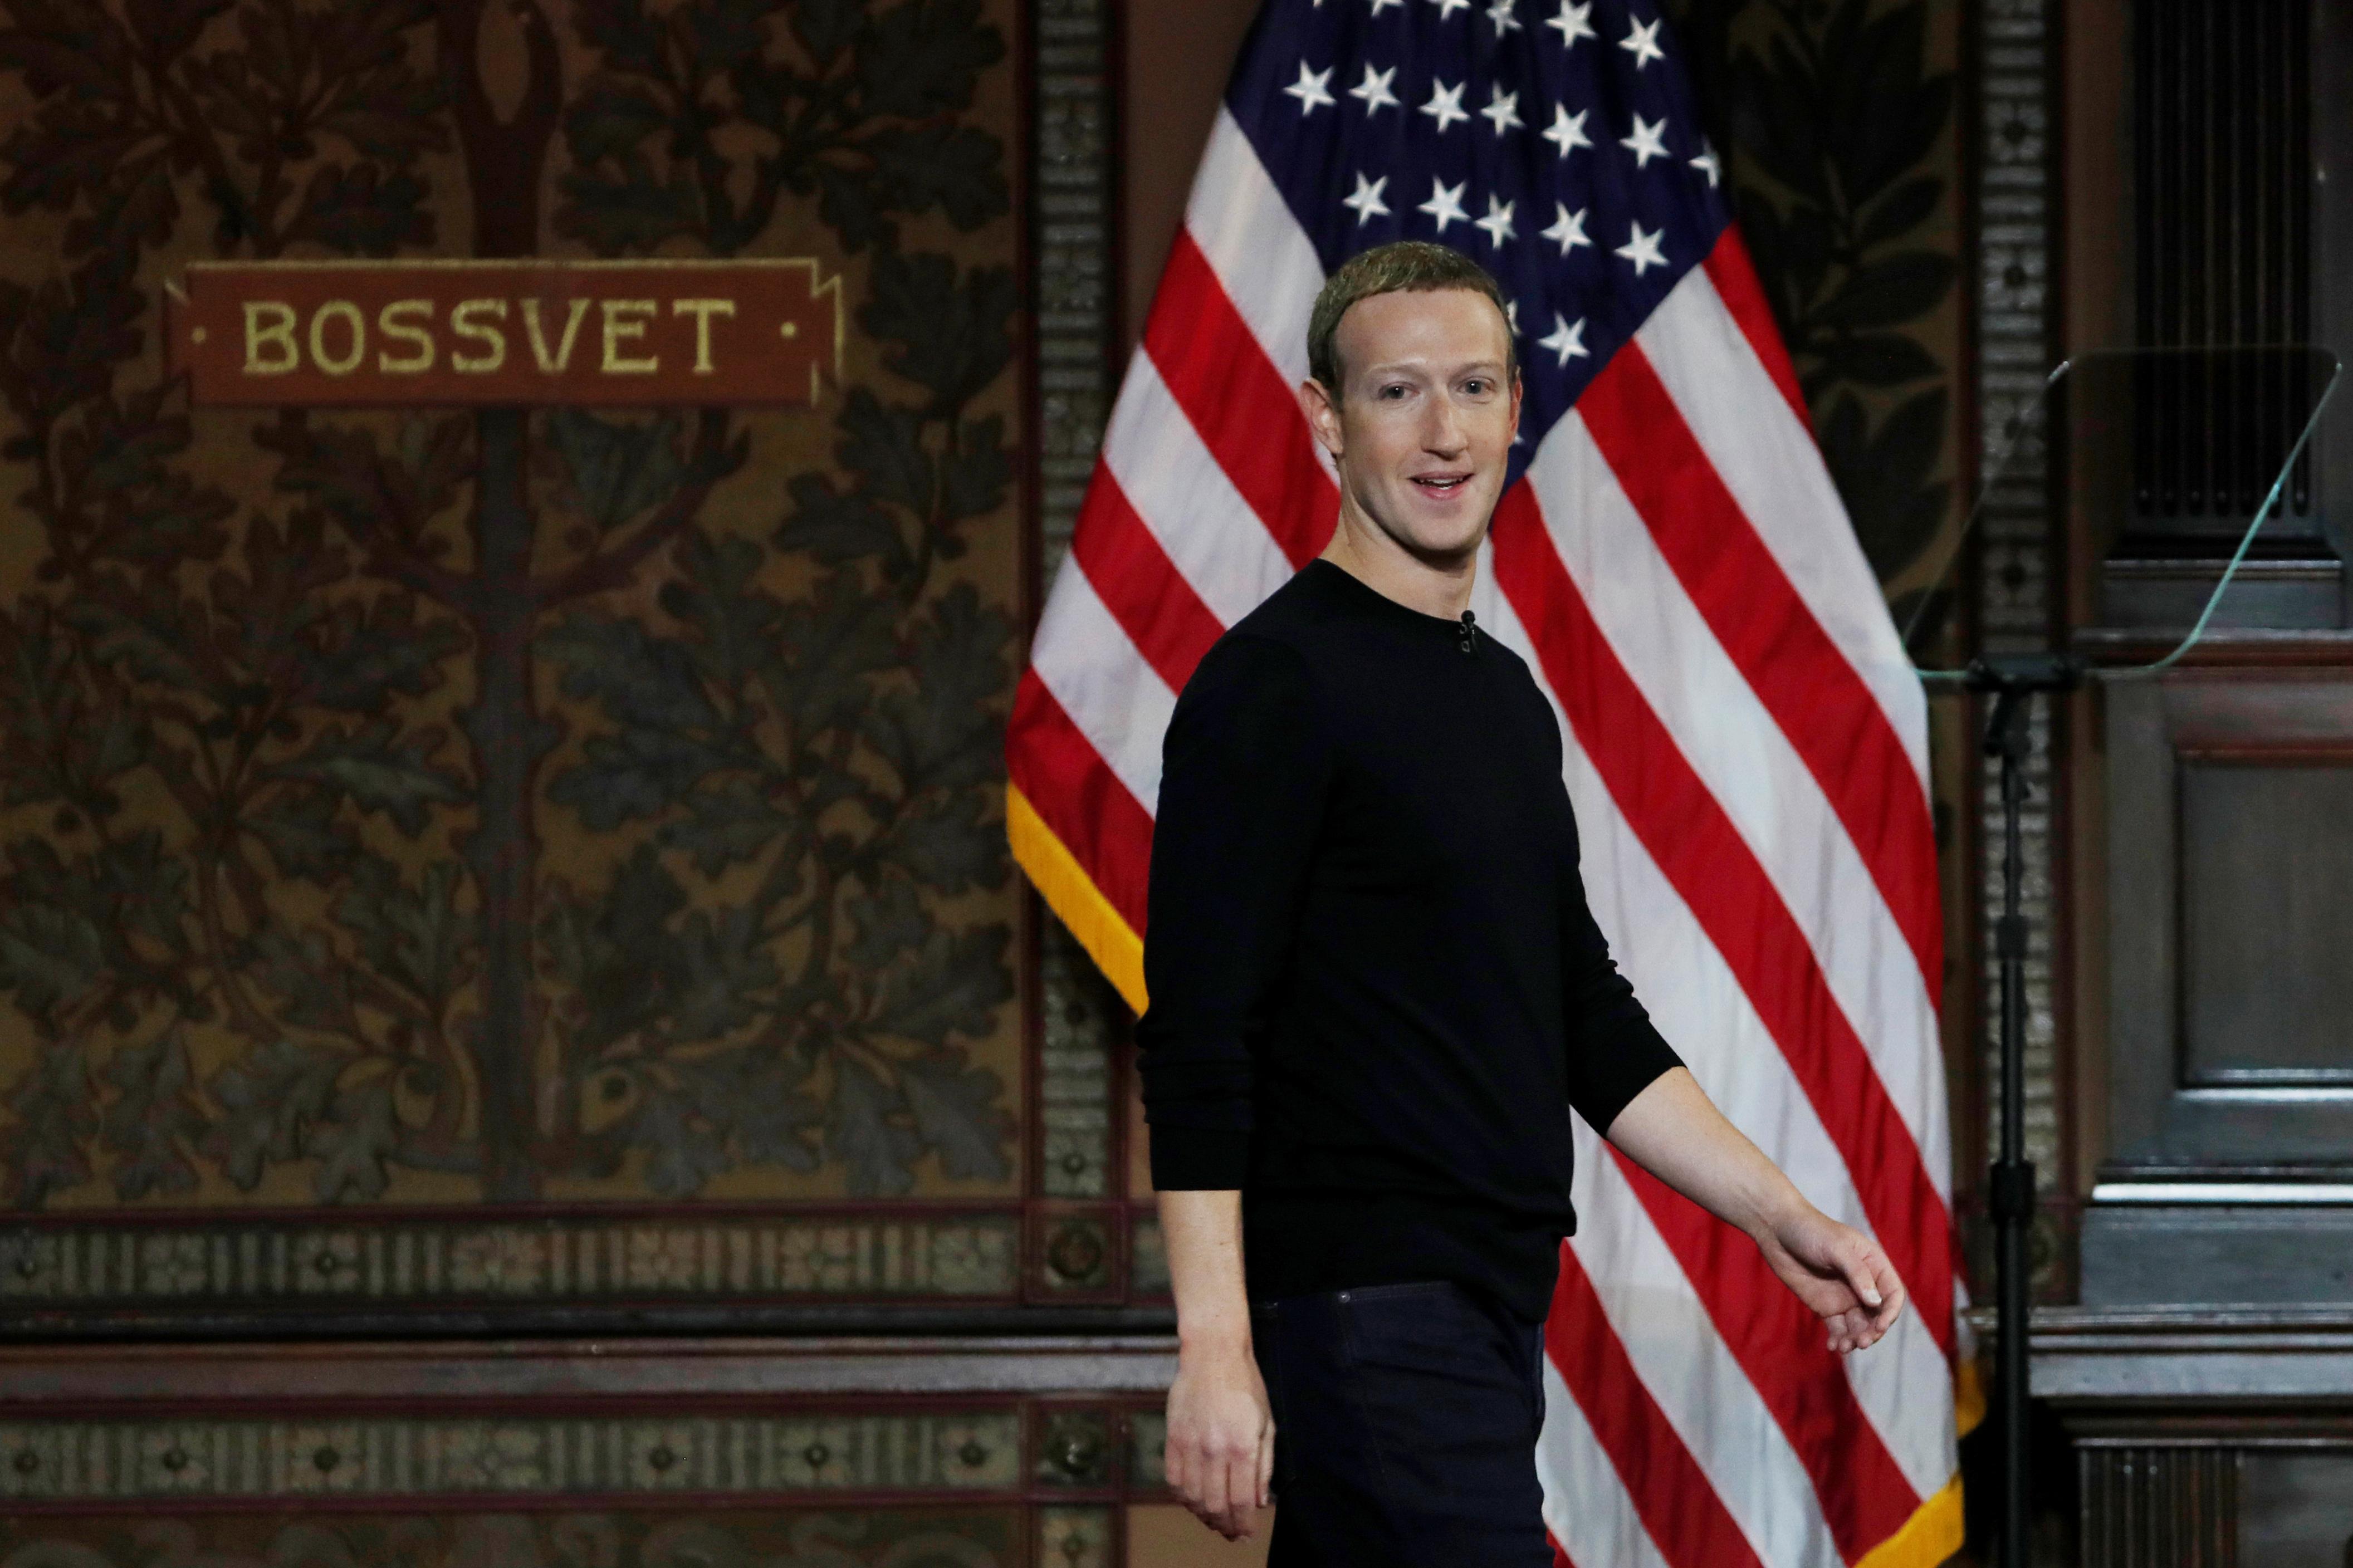 Zuckerberg defends Facebook's approach to free speech, draws line...